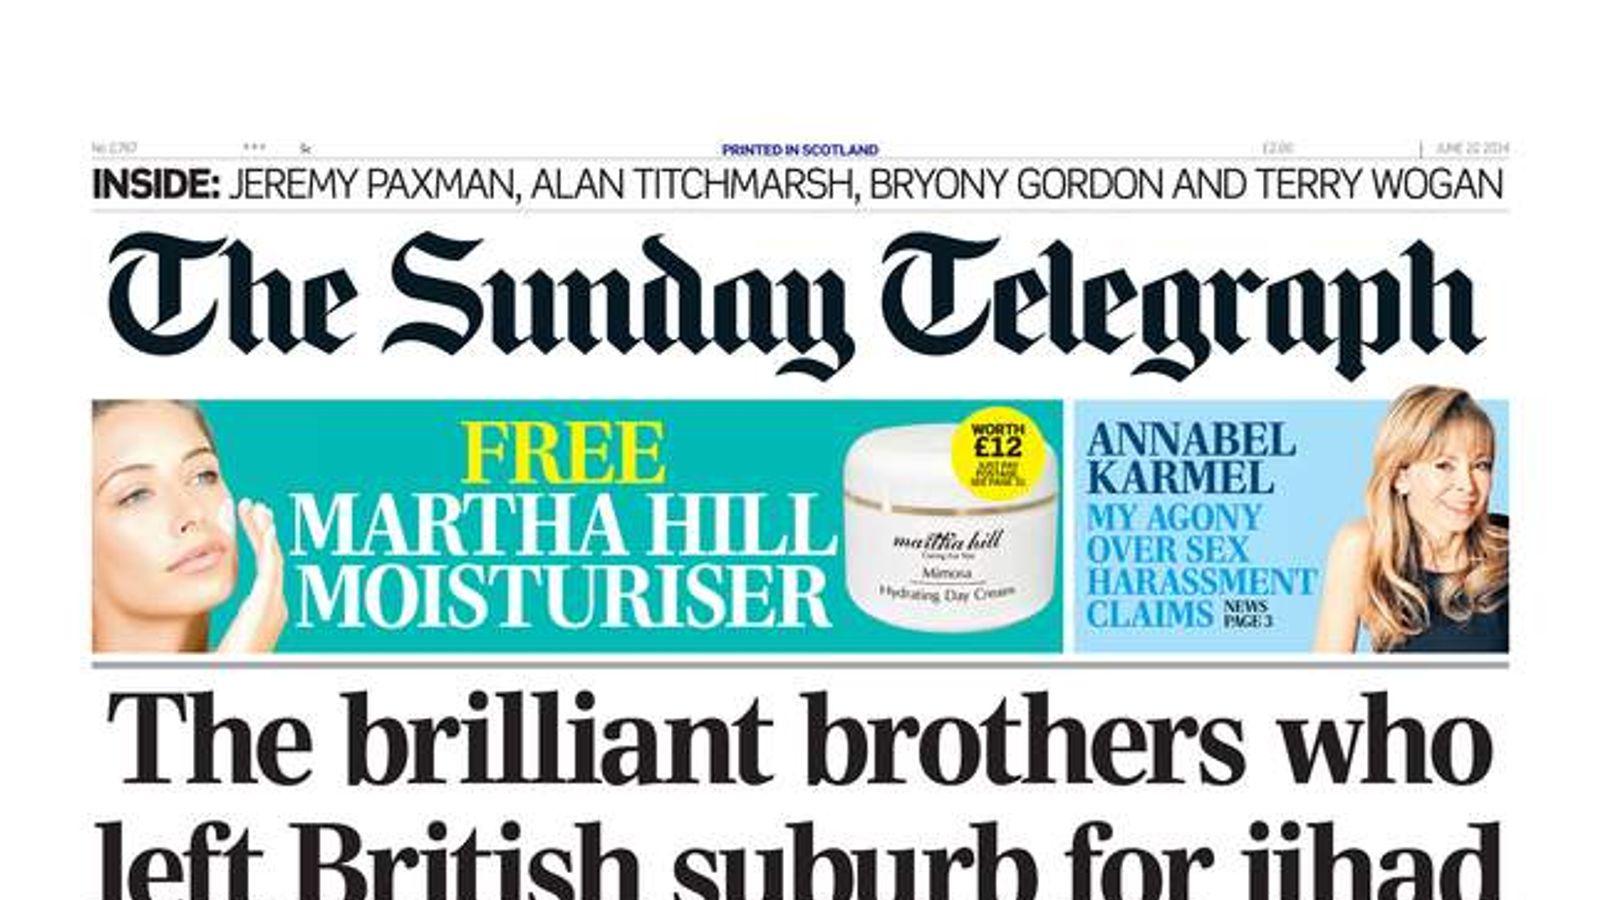 The Sunday Telegraph